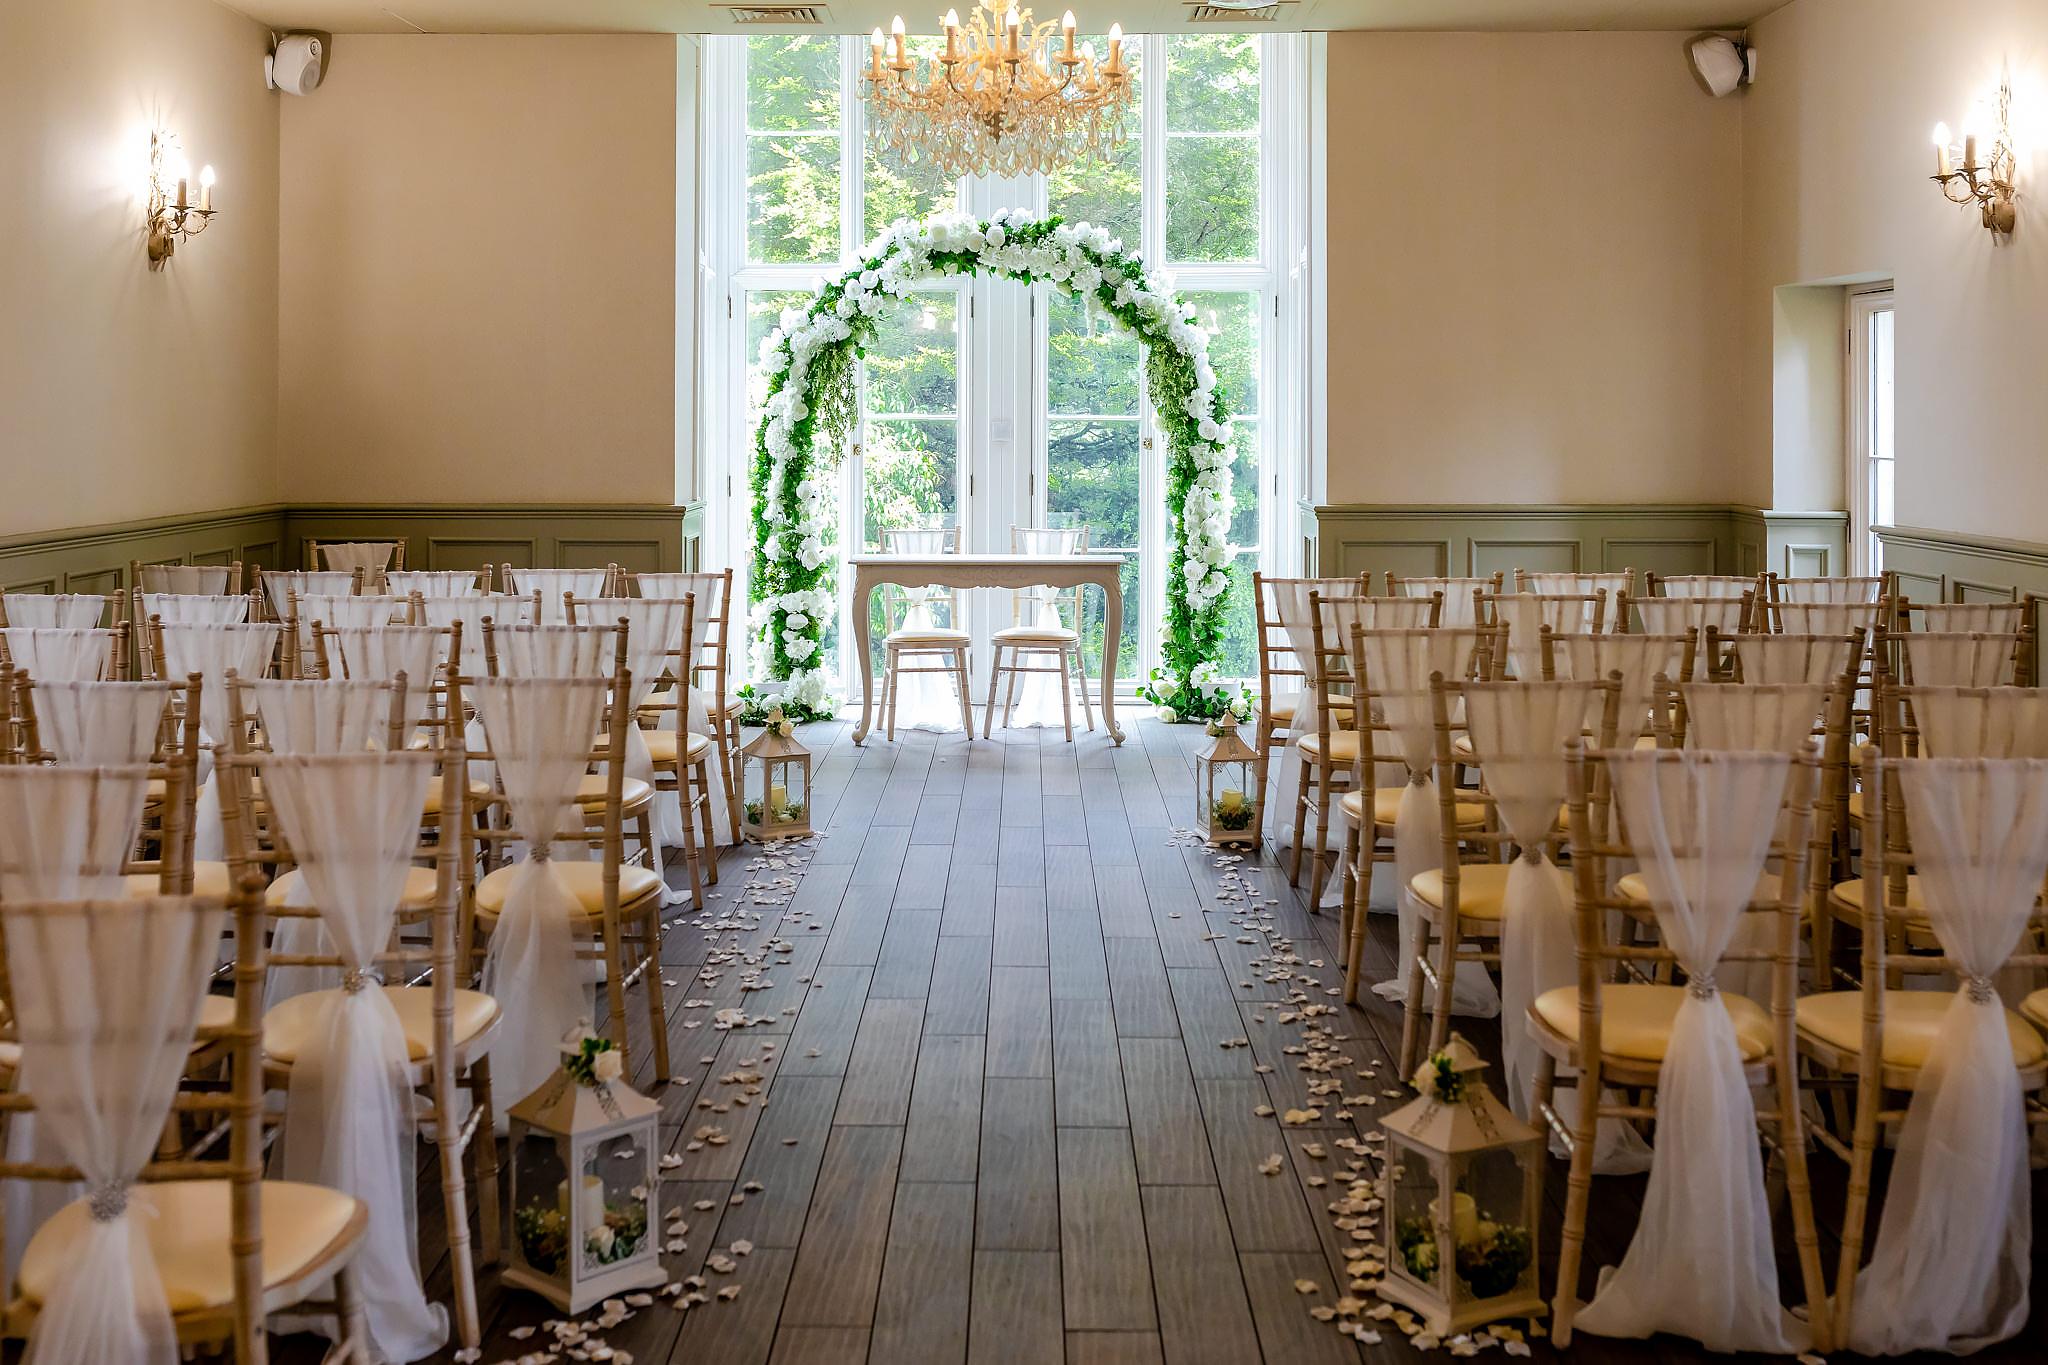 Bryngarw House Wedding Photography - Ceremony Room